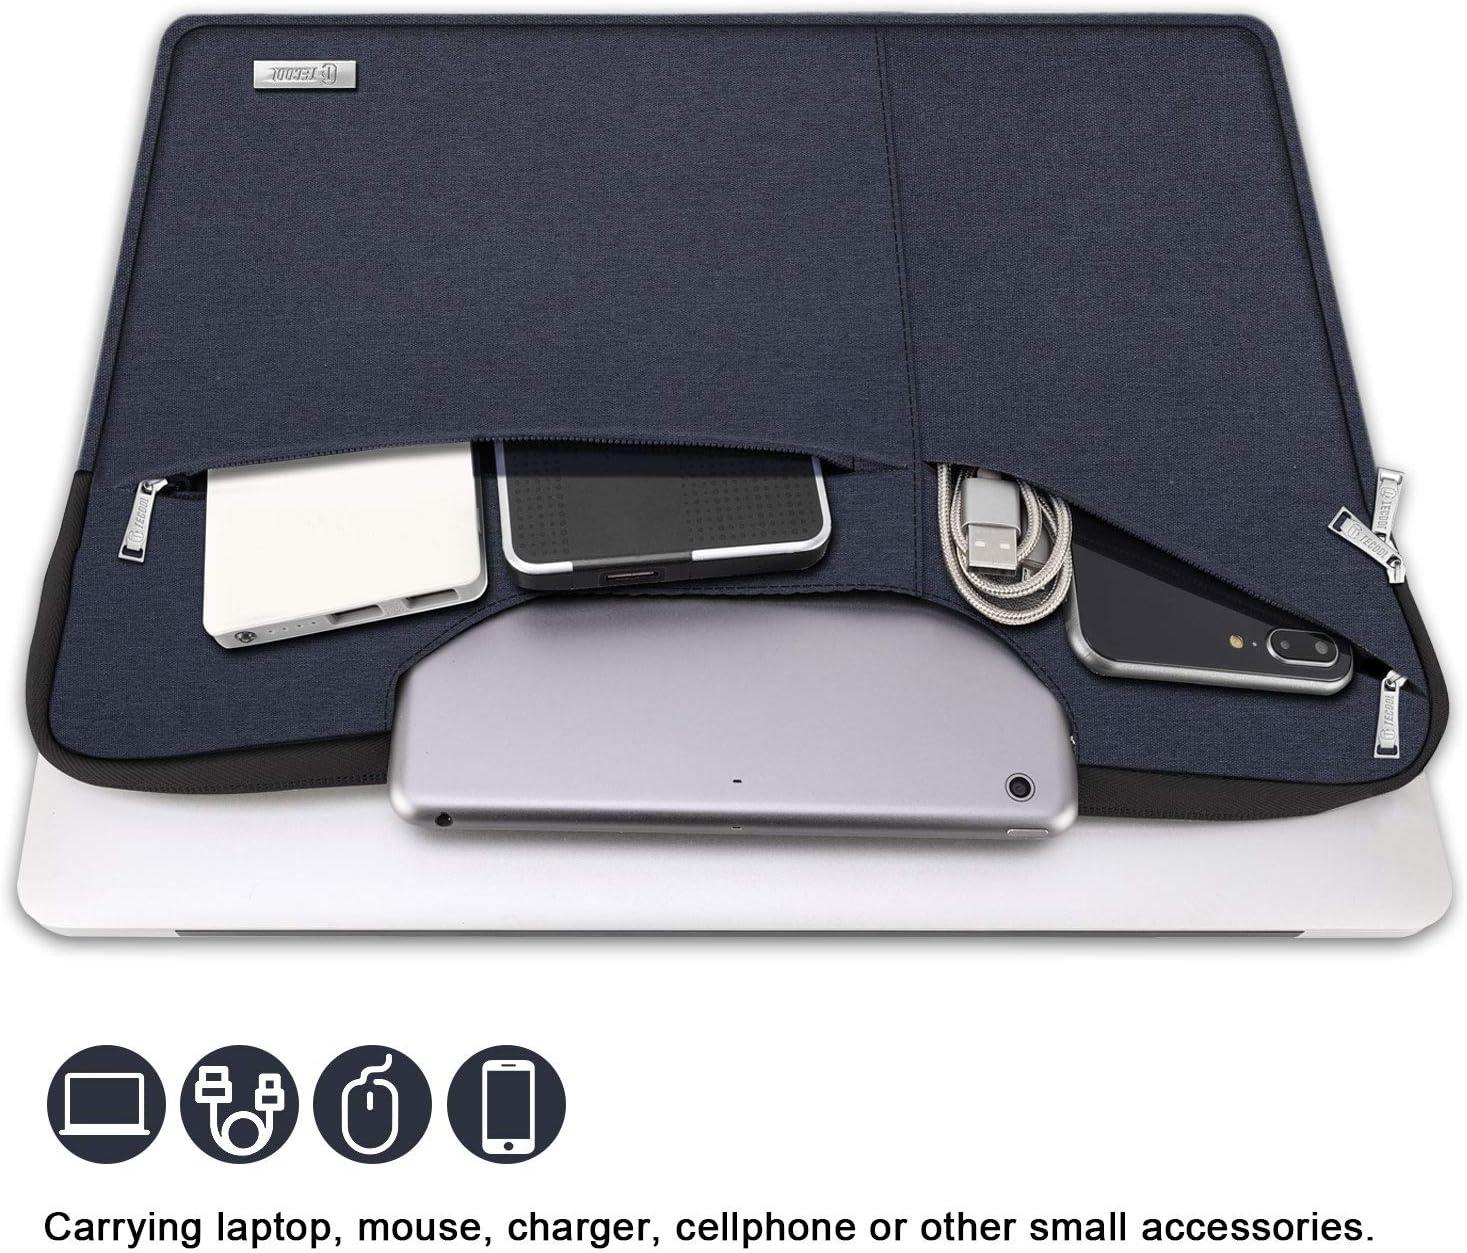 Bolso Protectora Acolchada Funda Blanda para 15,6 HP Lenovo Acer ASUS DELL Huawei Samsung PC Port/átiles Chromebook Nuevo Rosa TECOOL Funda Ordenador Port/átil de 15,6 Pulgadas